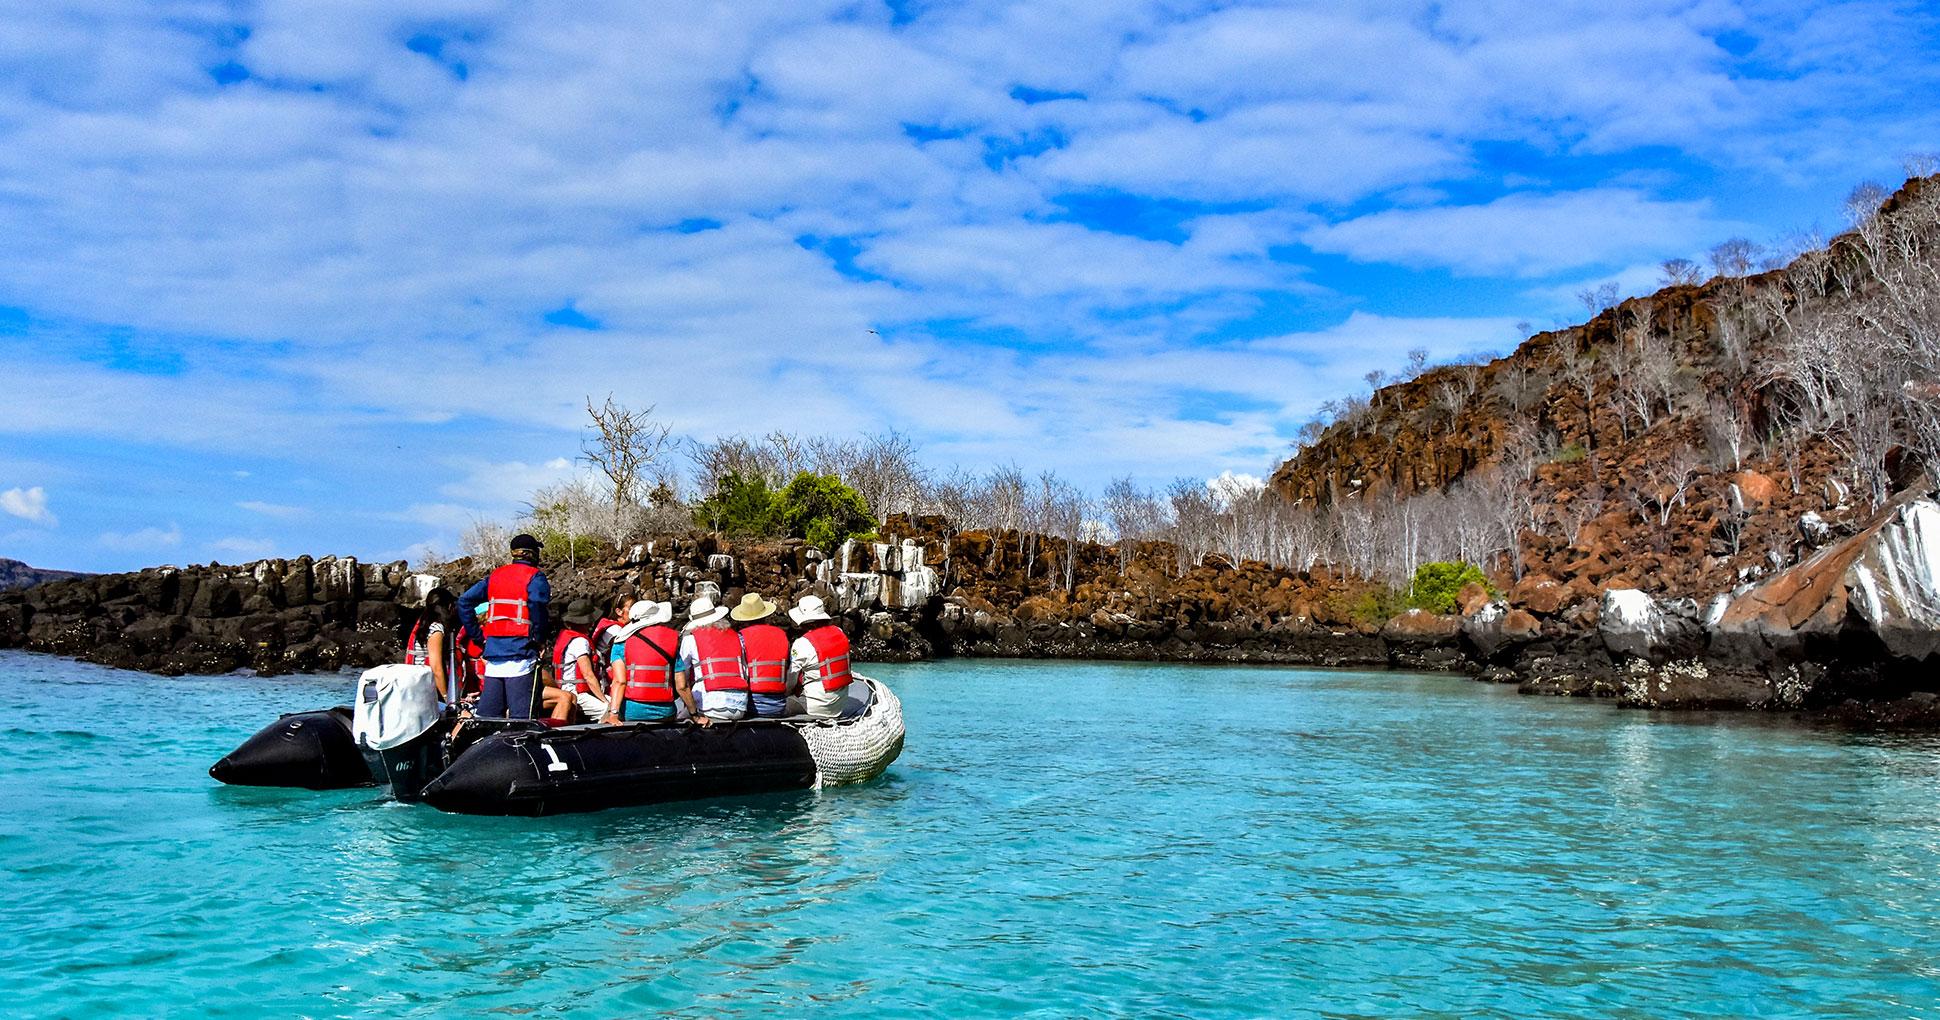 Panga ride on Punta Carrion, Galapagos Islands